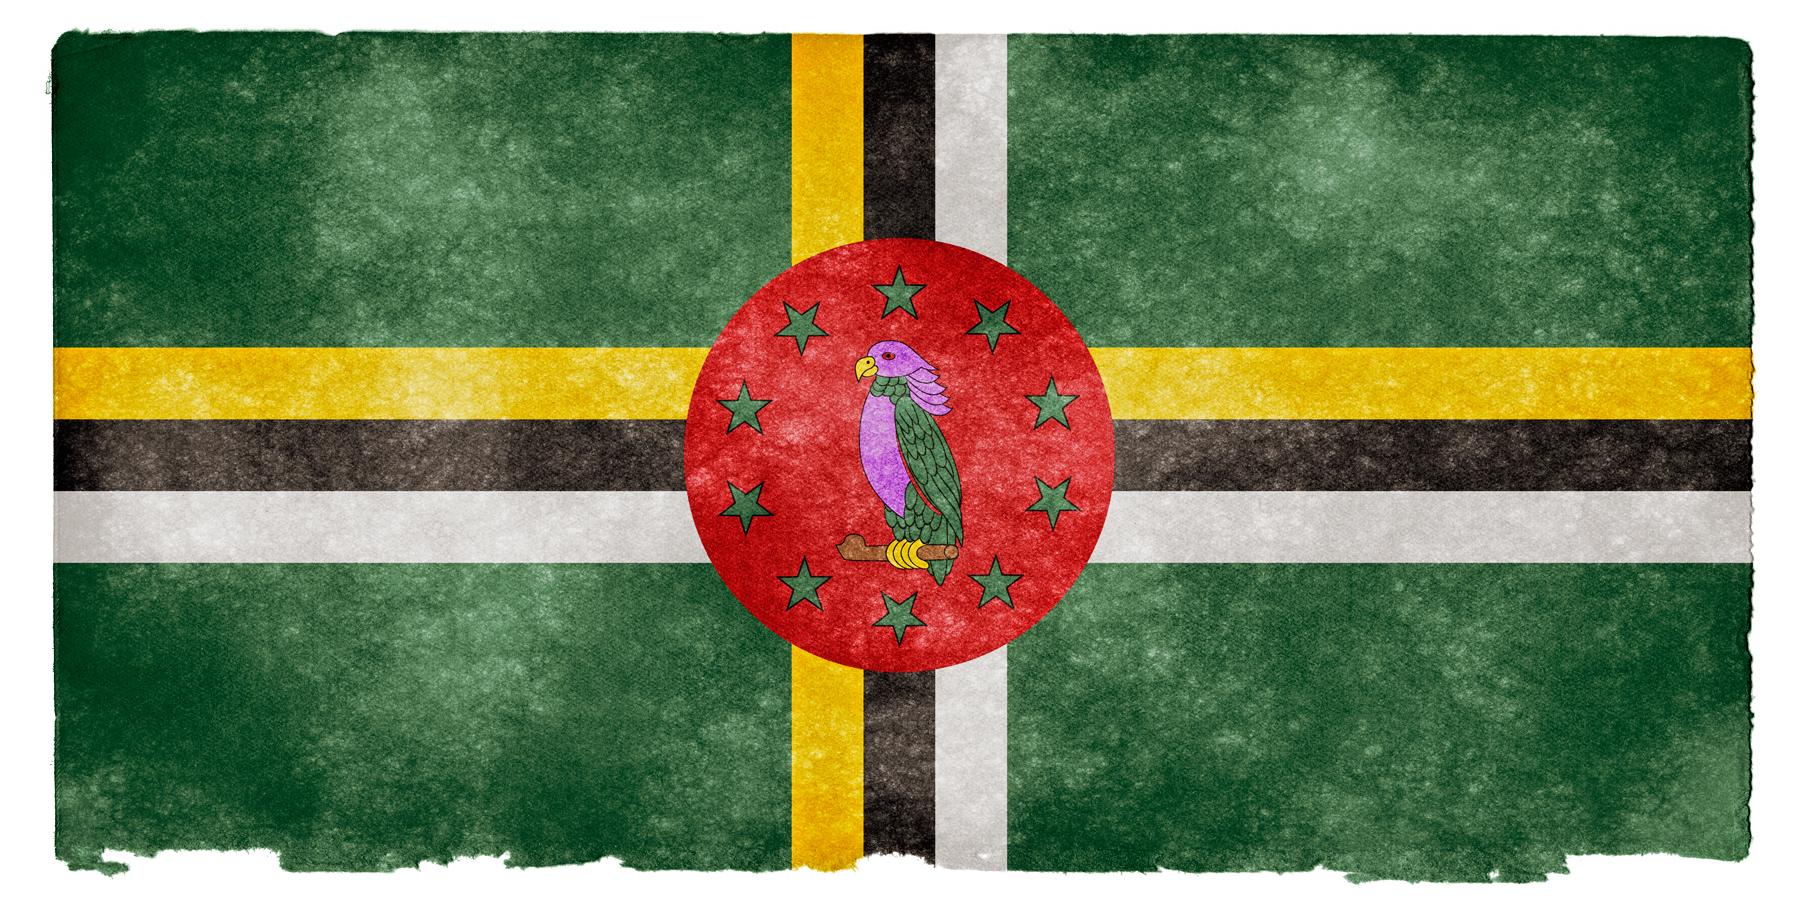 Dominica grunge flag photo